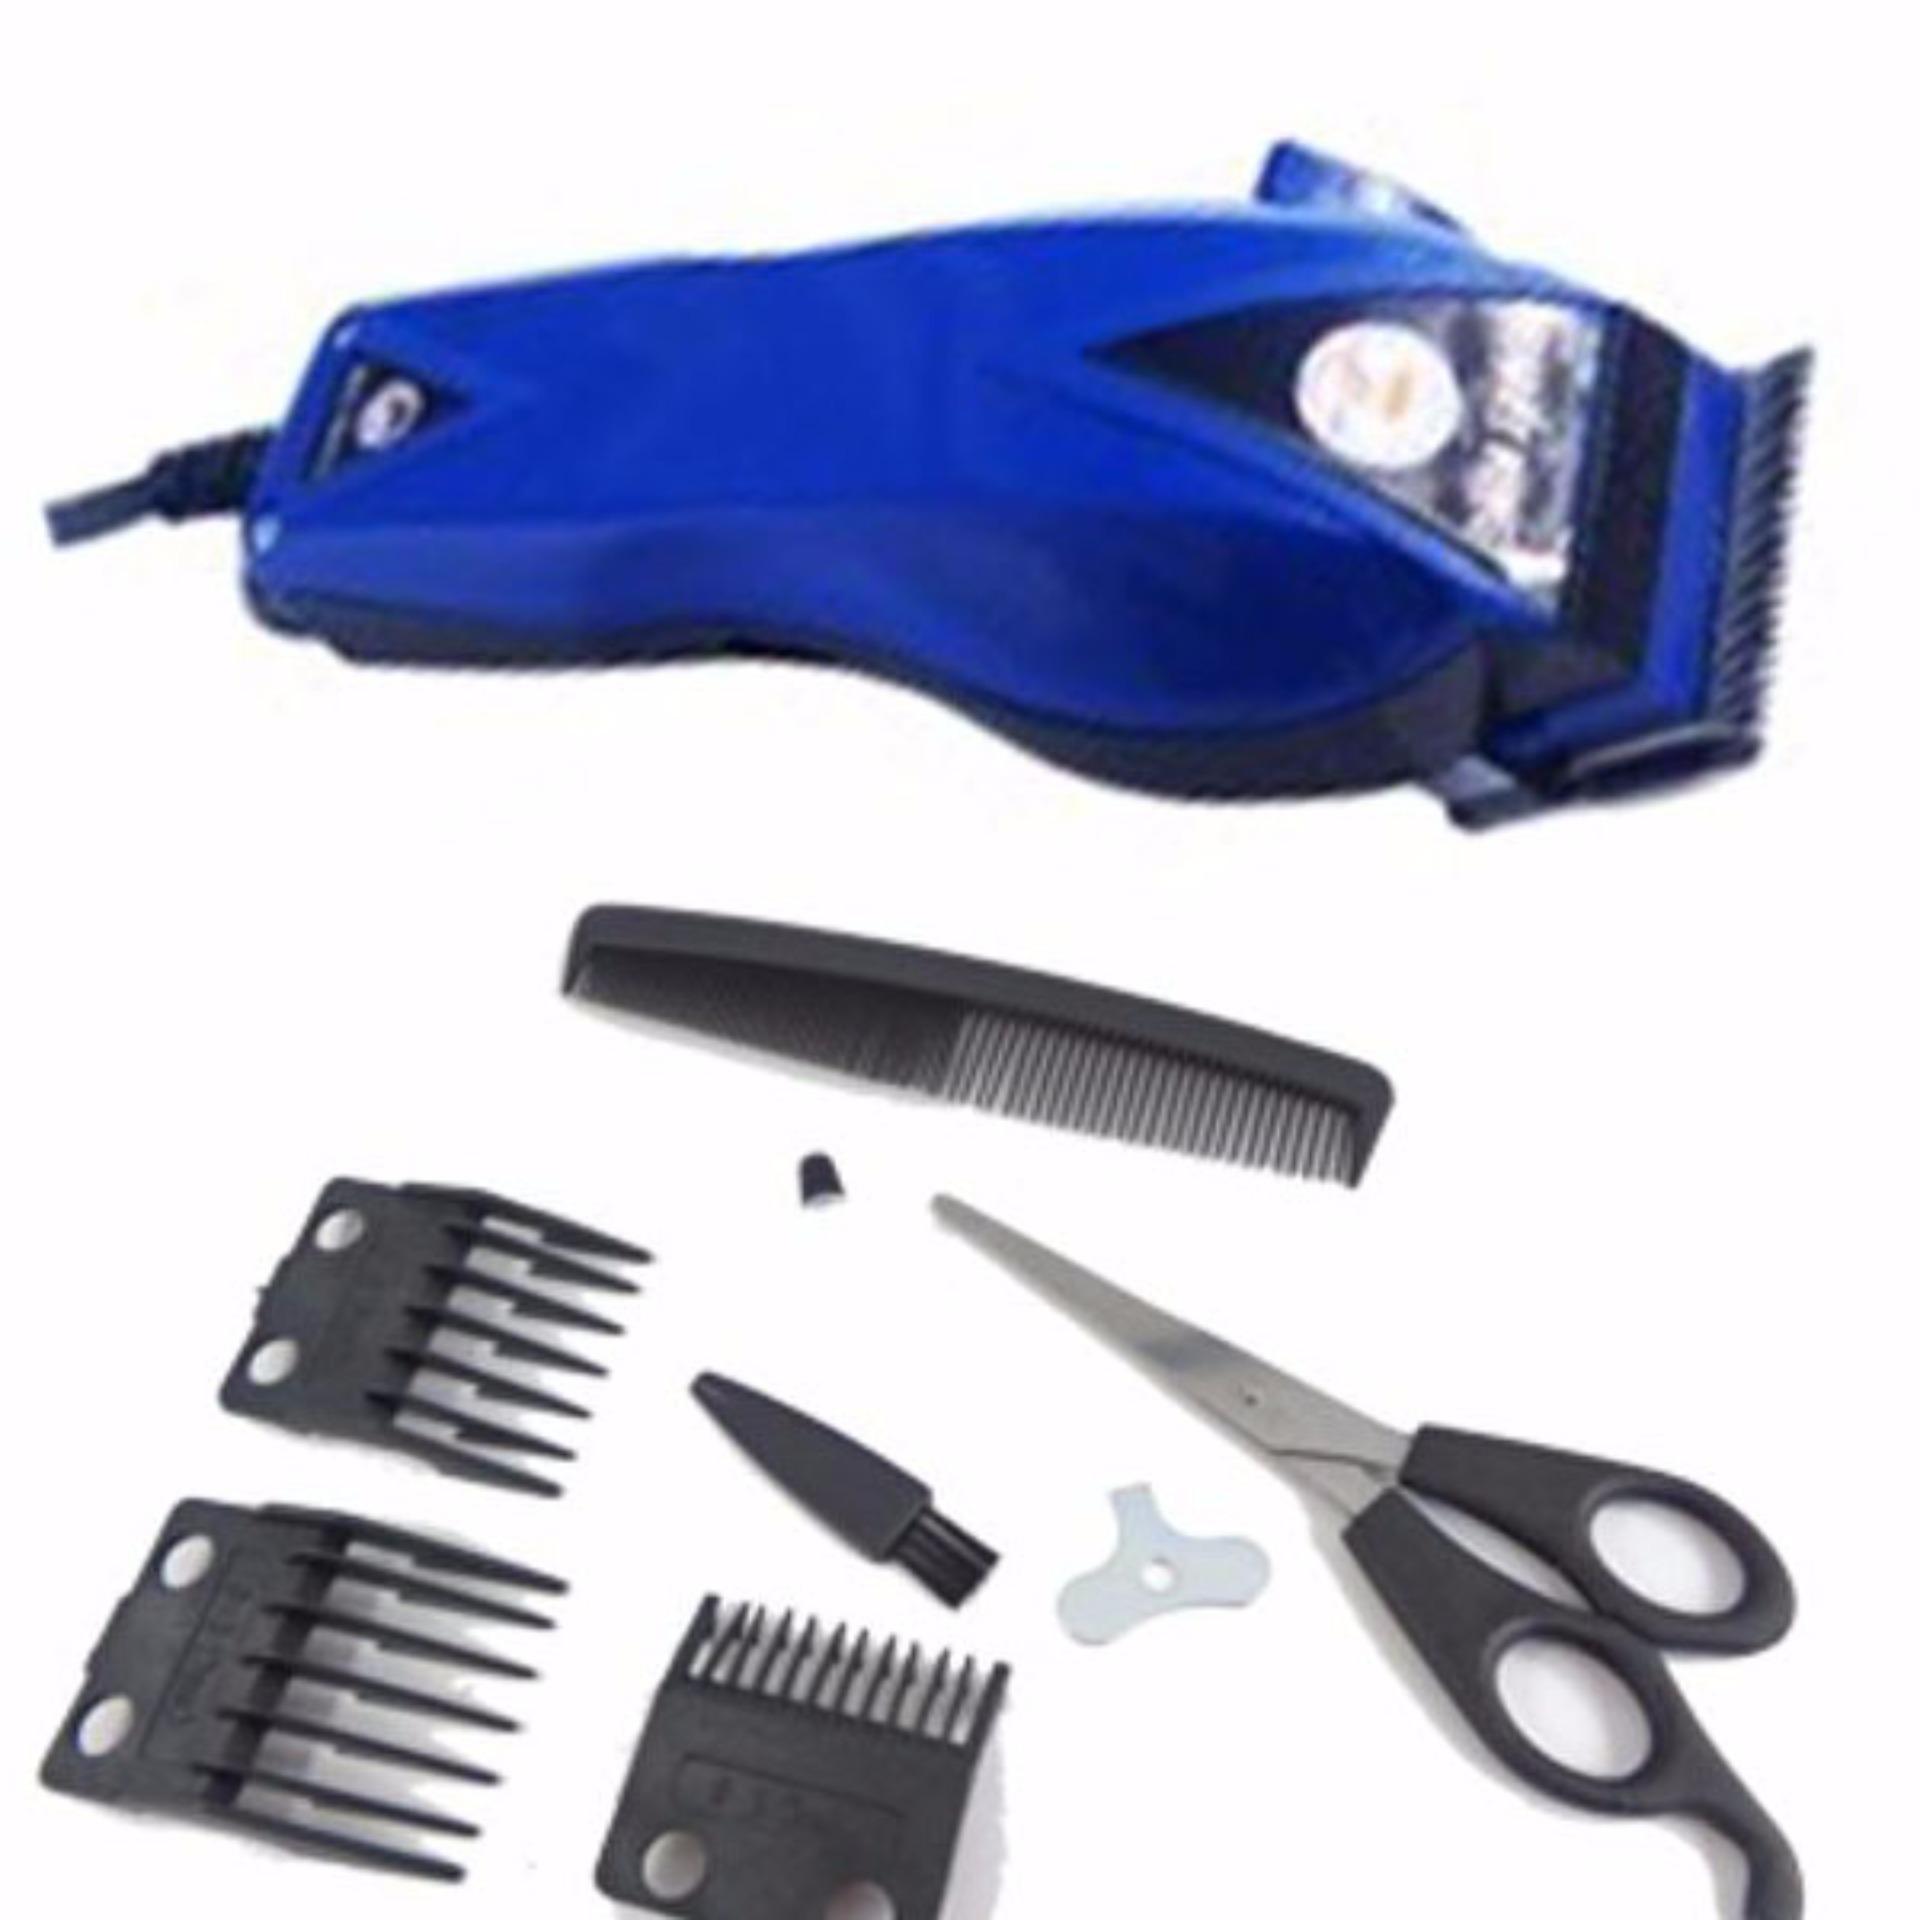 Flash Sale Happy King HK-900 Alat Cukur Rambut Hair Clipper Trimmer Mesin  Potong Professional Groomer 3 Mata Pisau Tajam Hemat Energi - Biru Tua 2023b8f74d